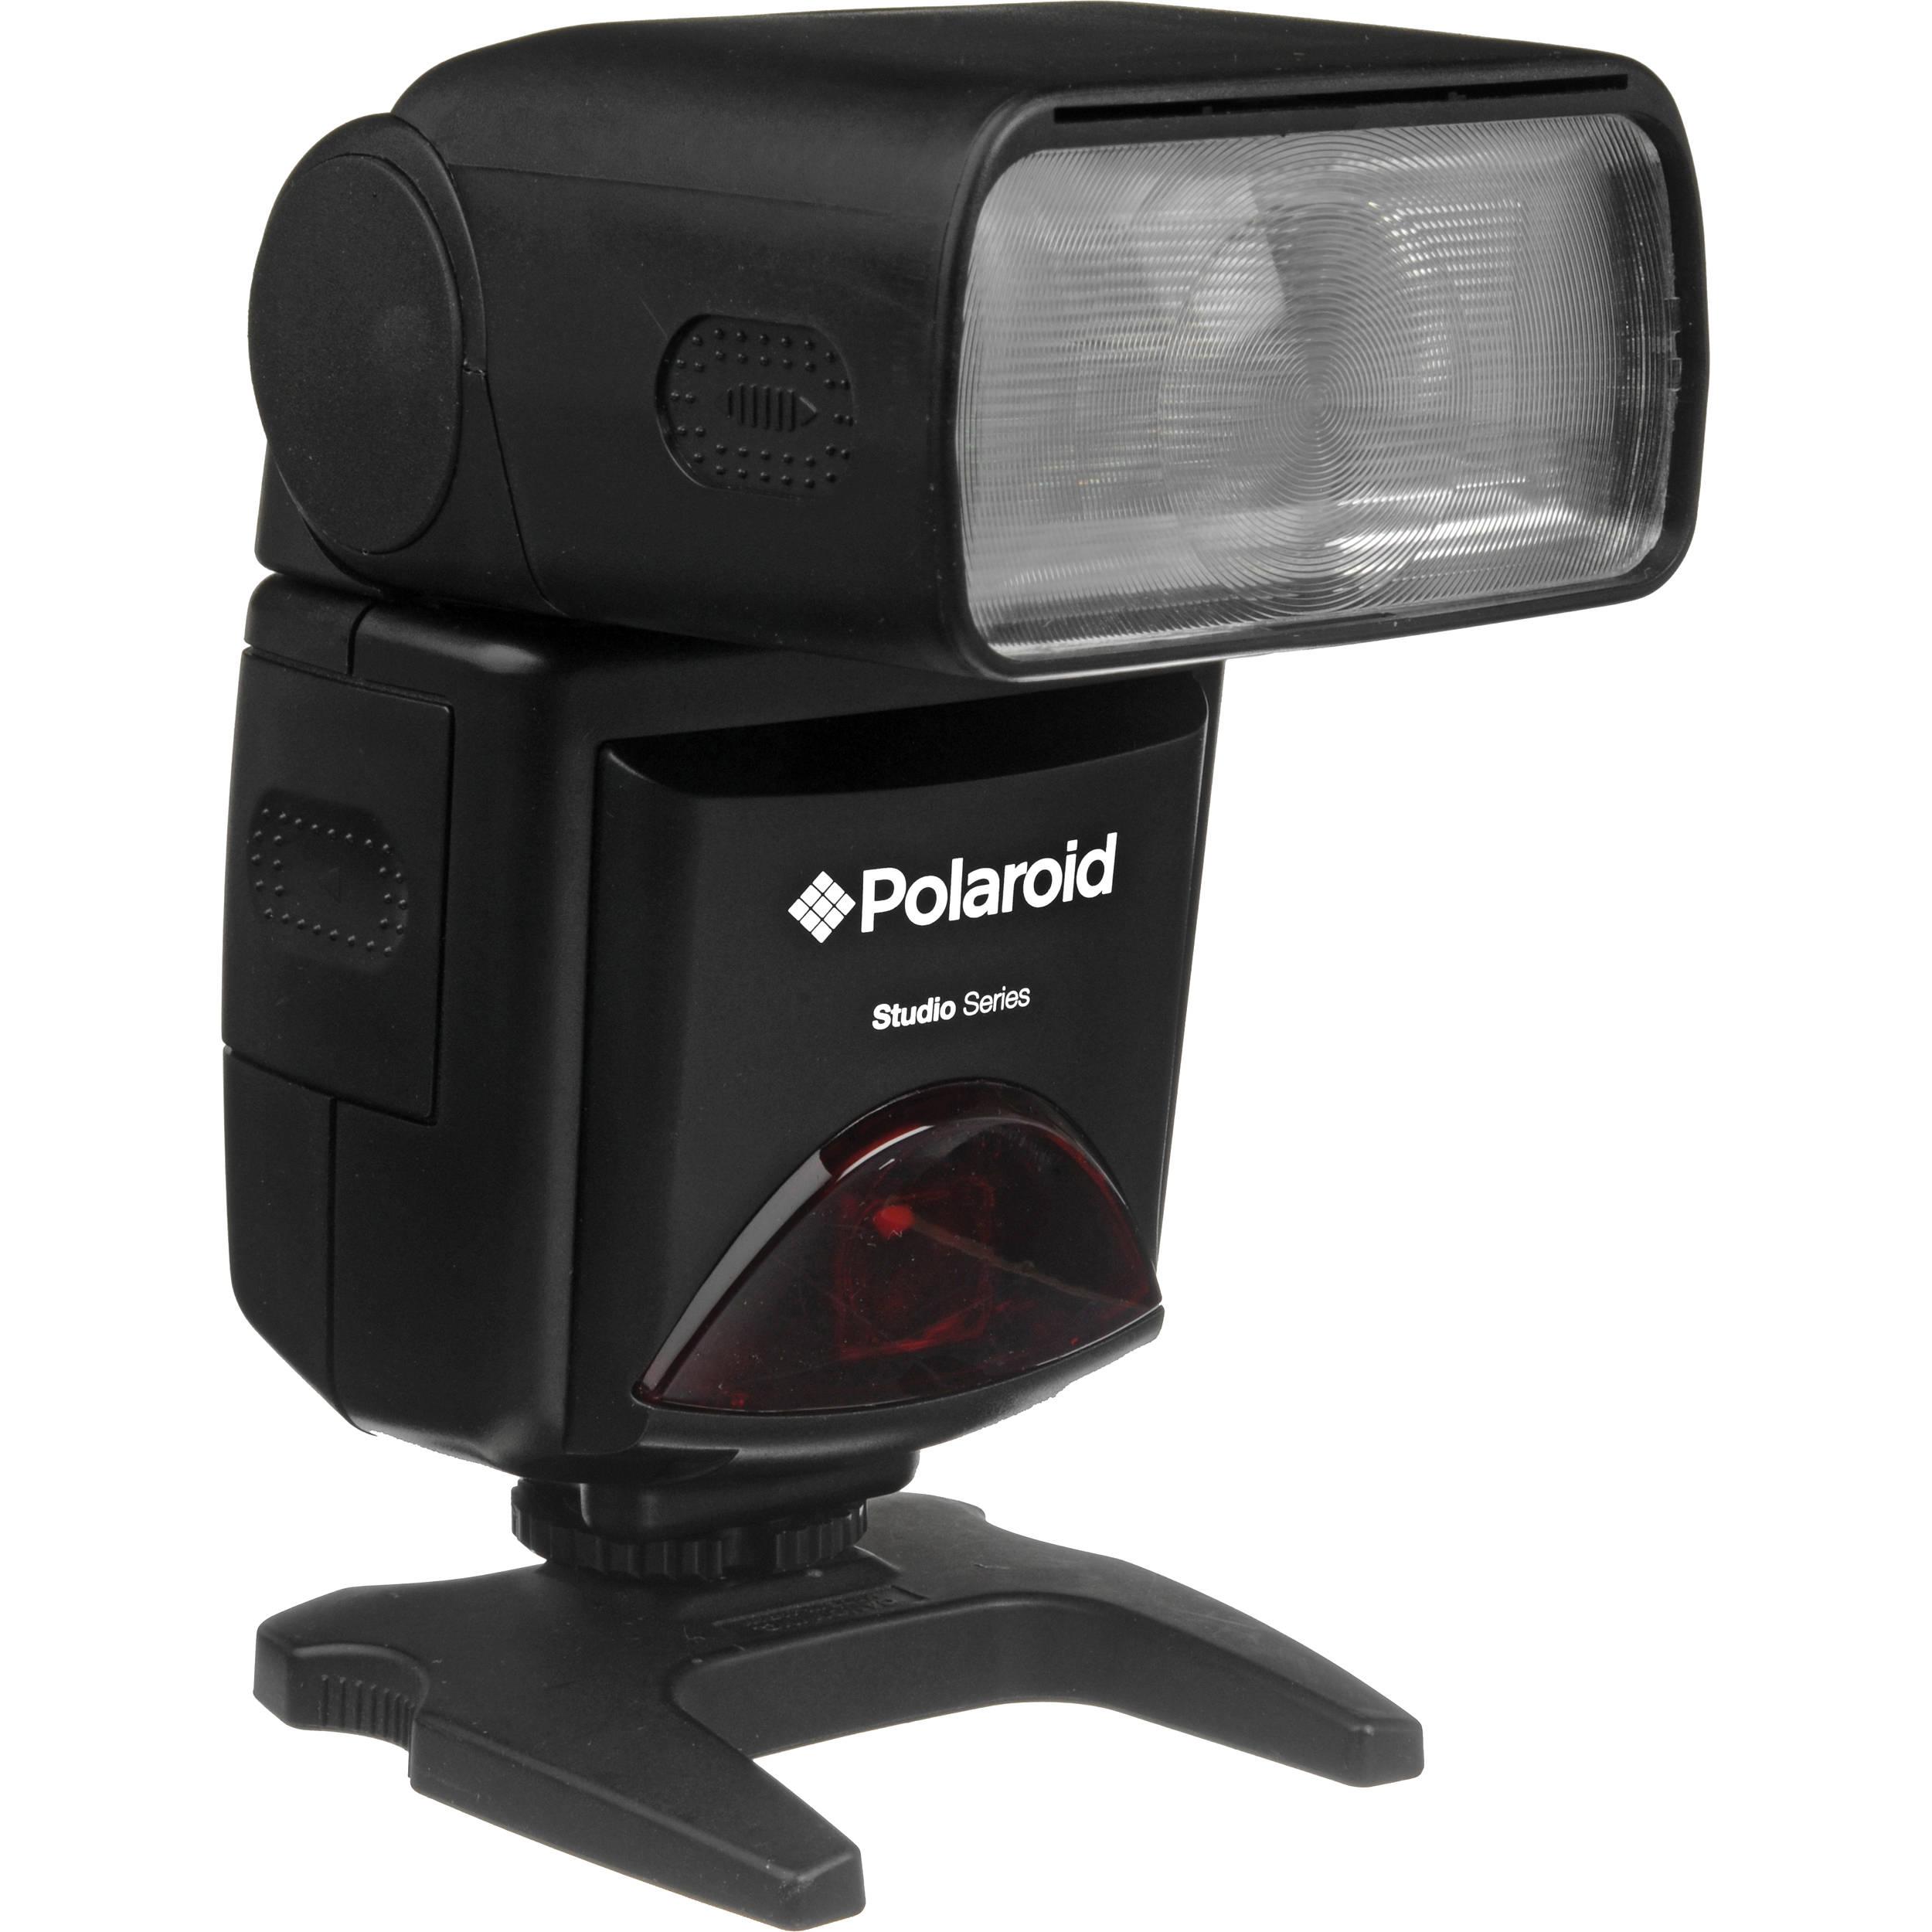 Minolta Camera Price For Sony/minolta Cameras